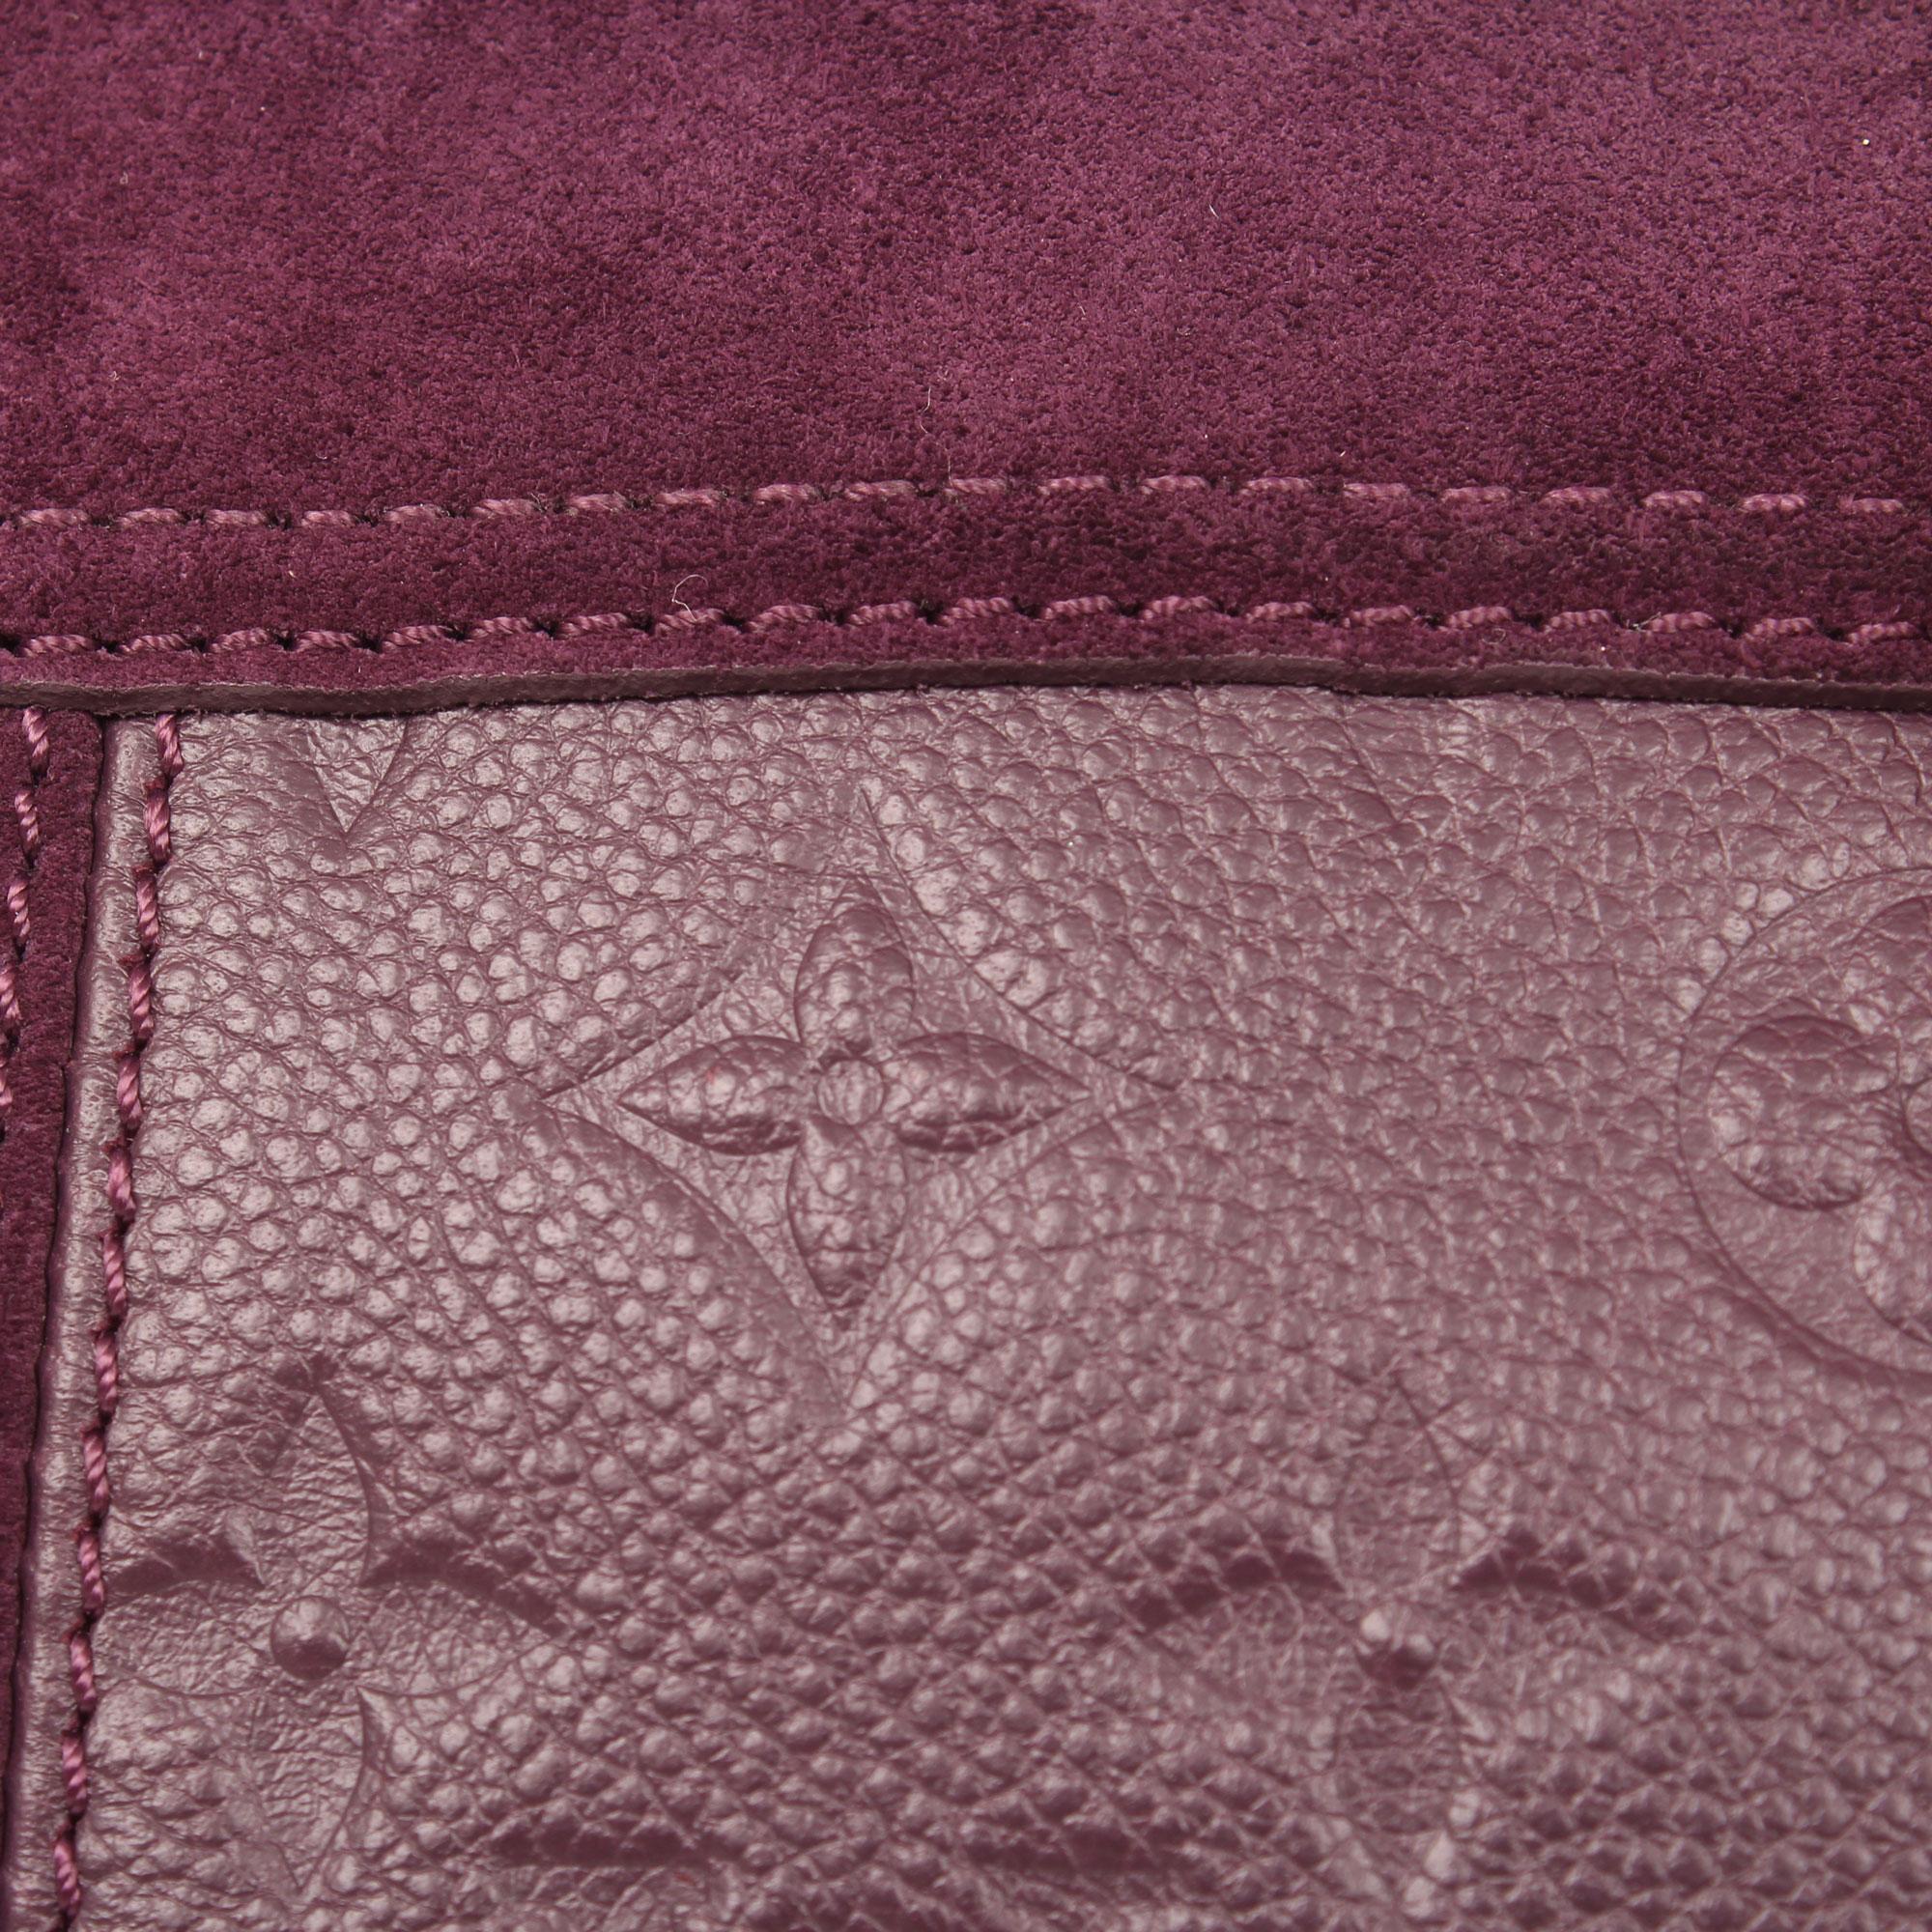 Detail image of bolso louis vuitton audacieuse embossed monogram suede plum